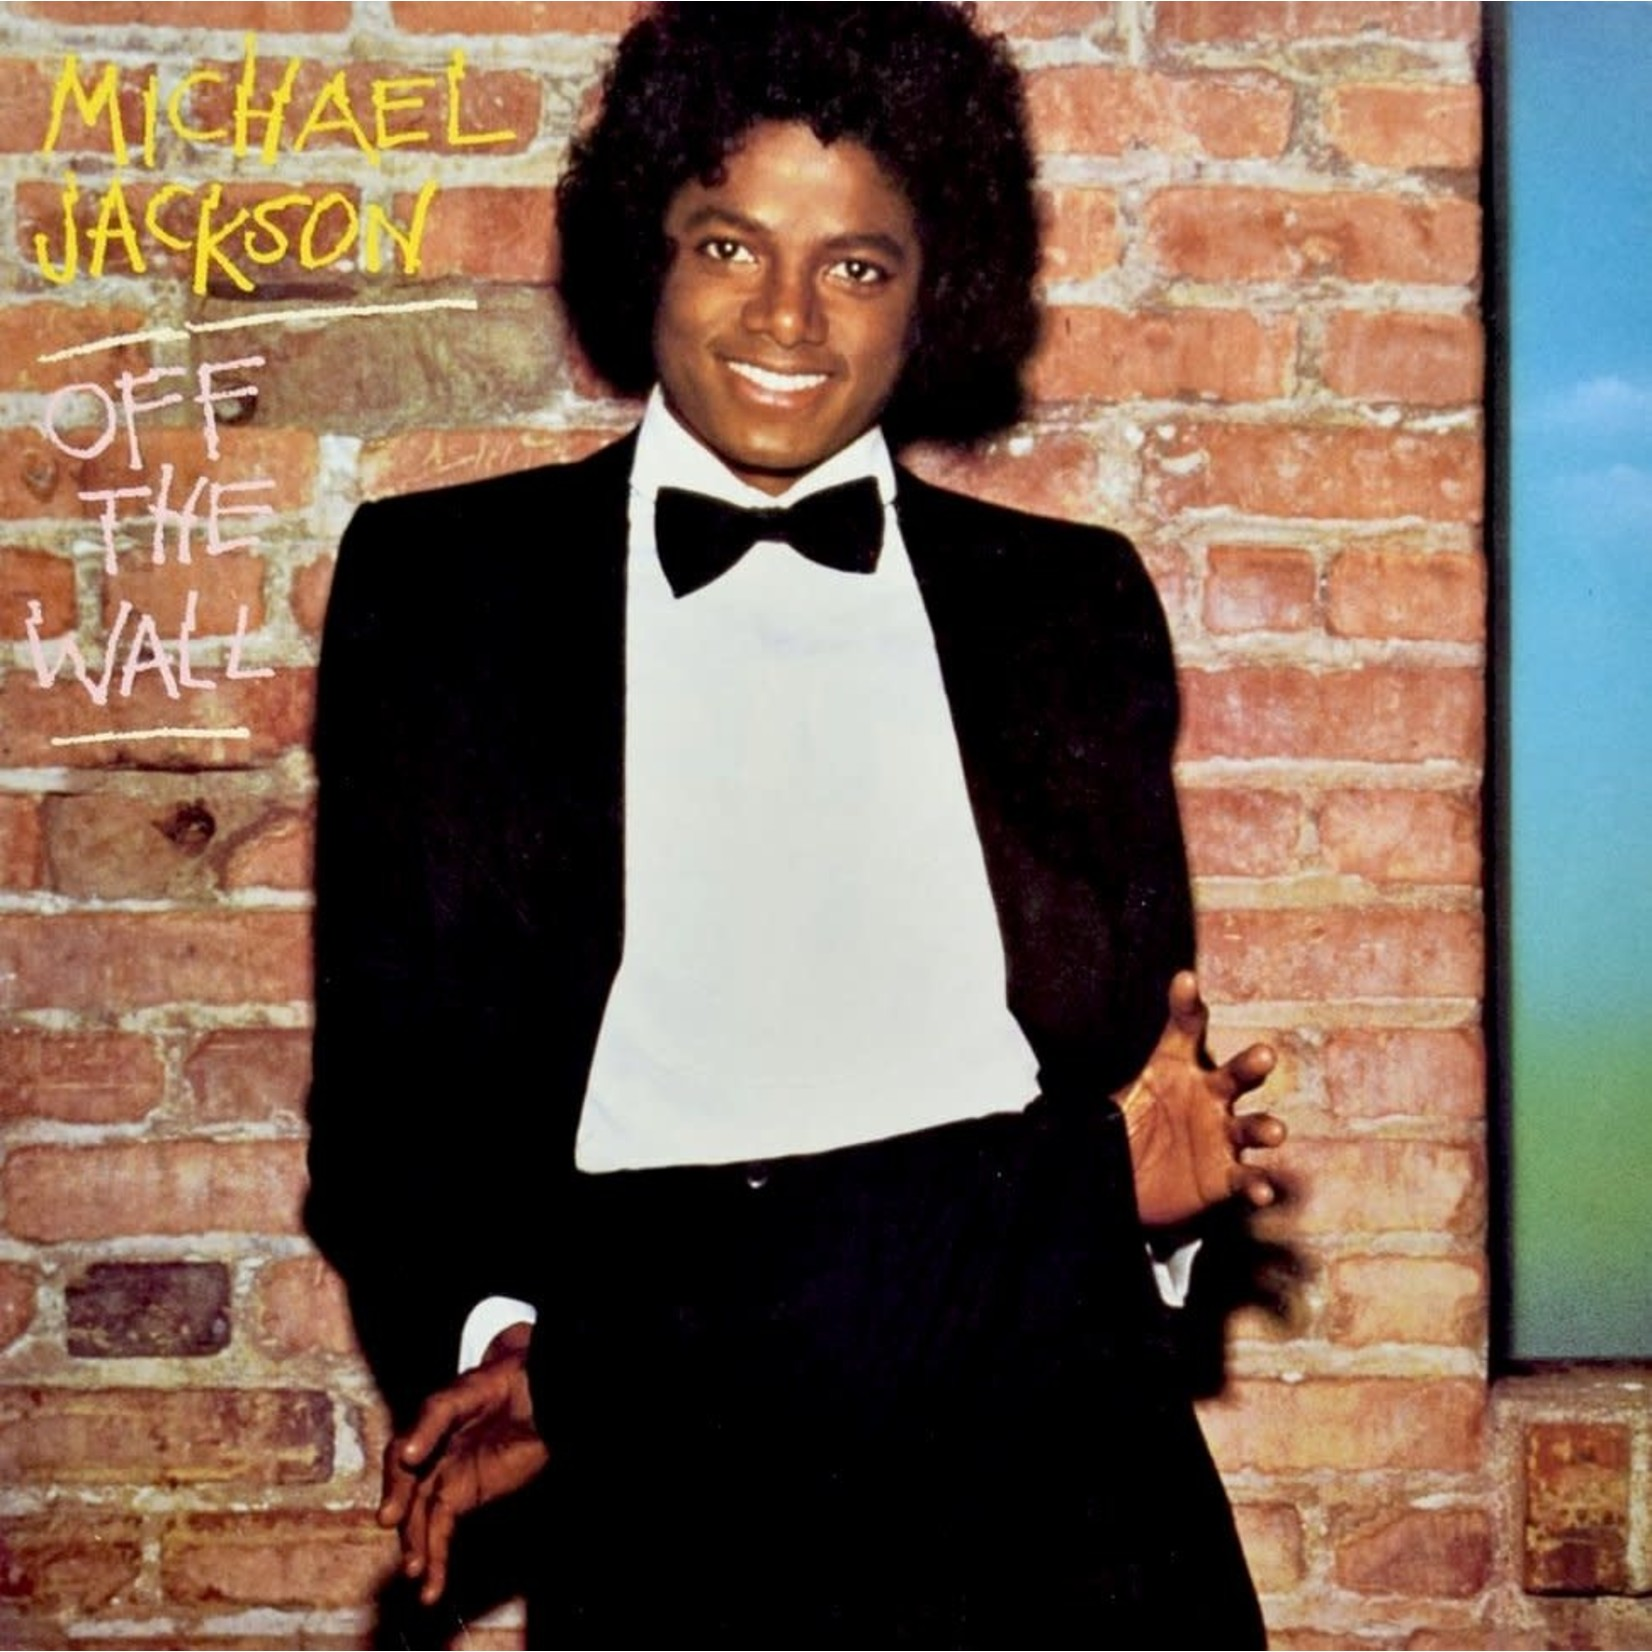 [Vintage] Jackson, Michael: Off the Wall